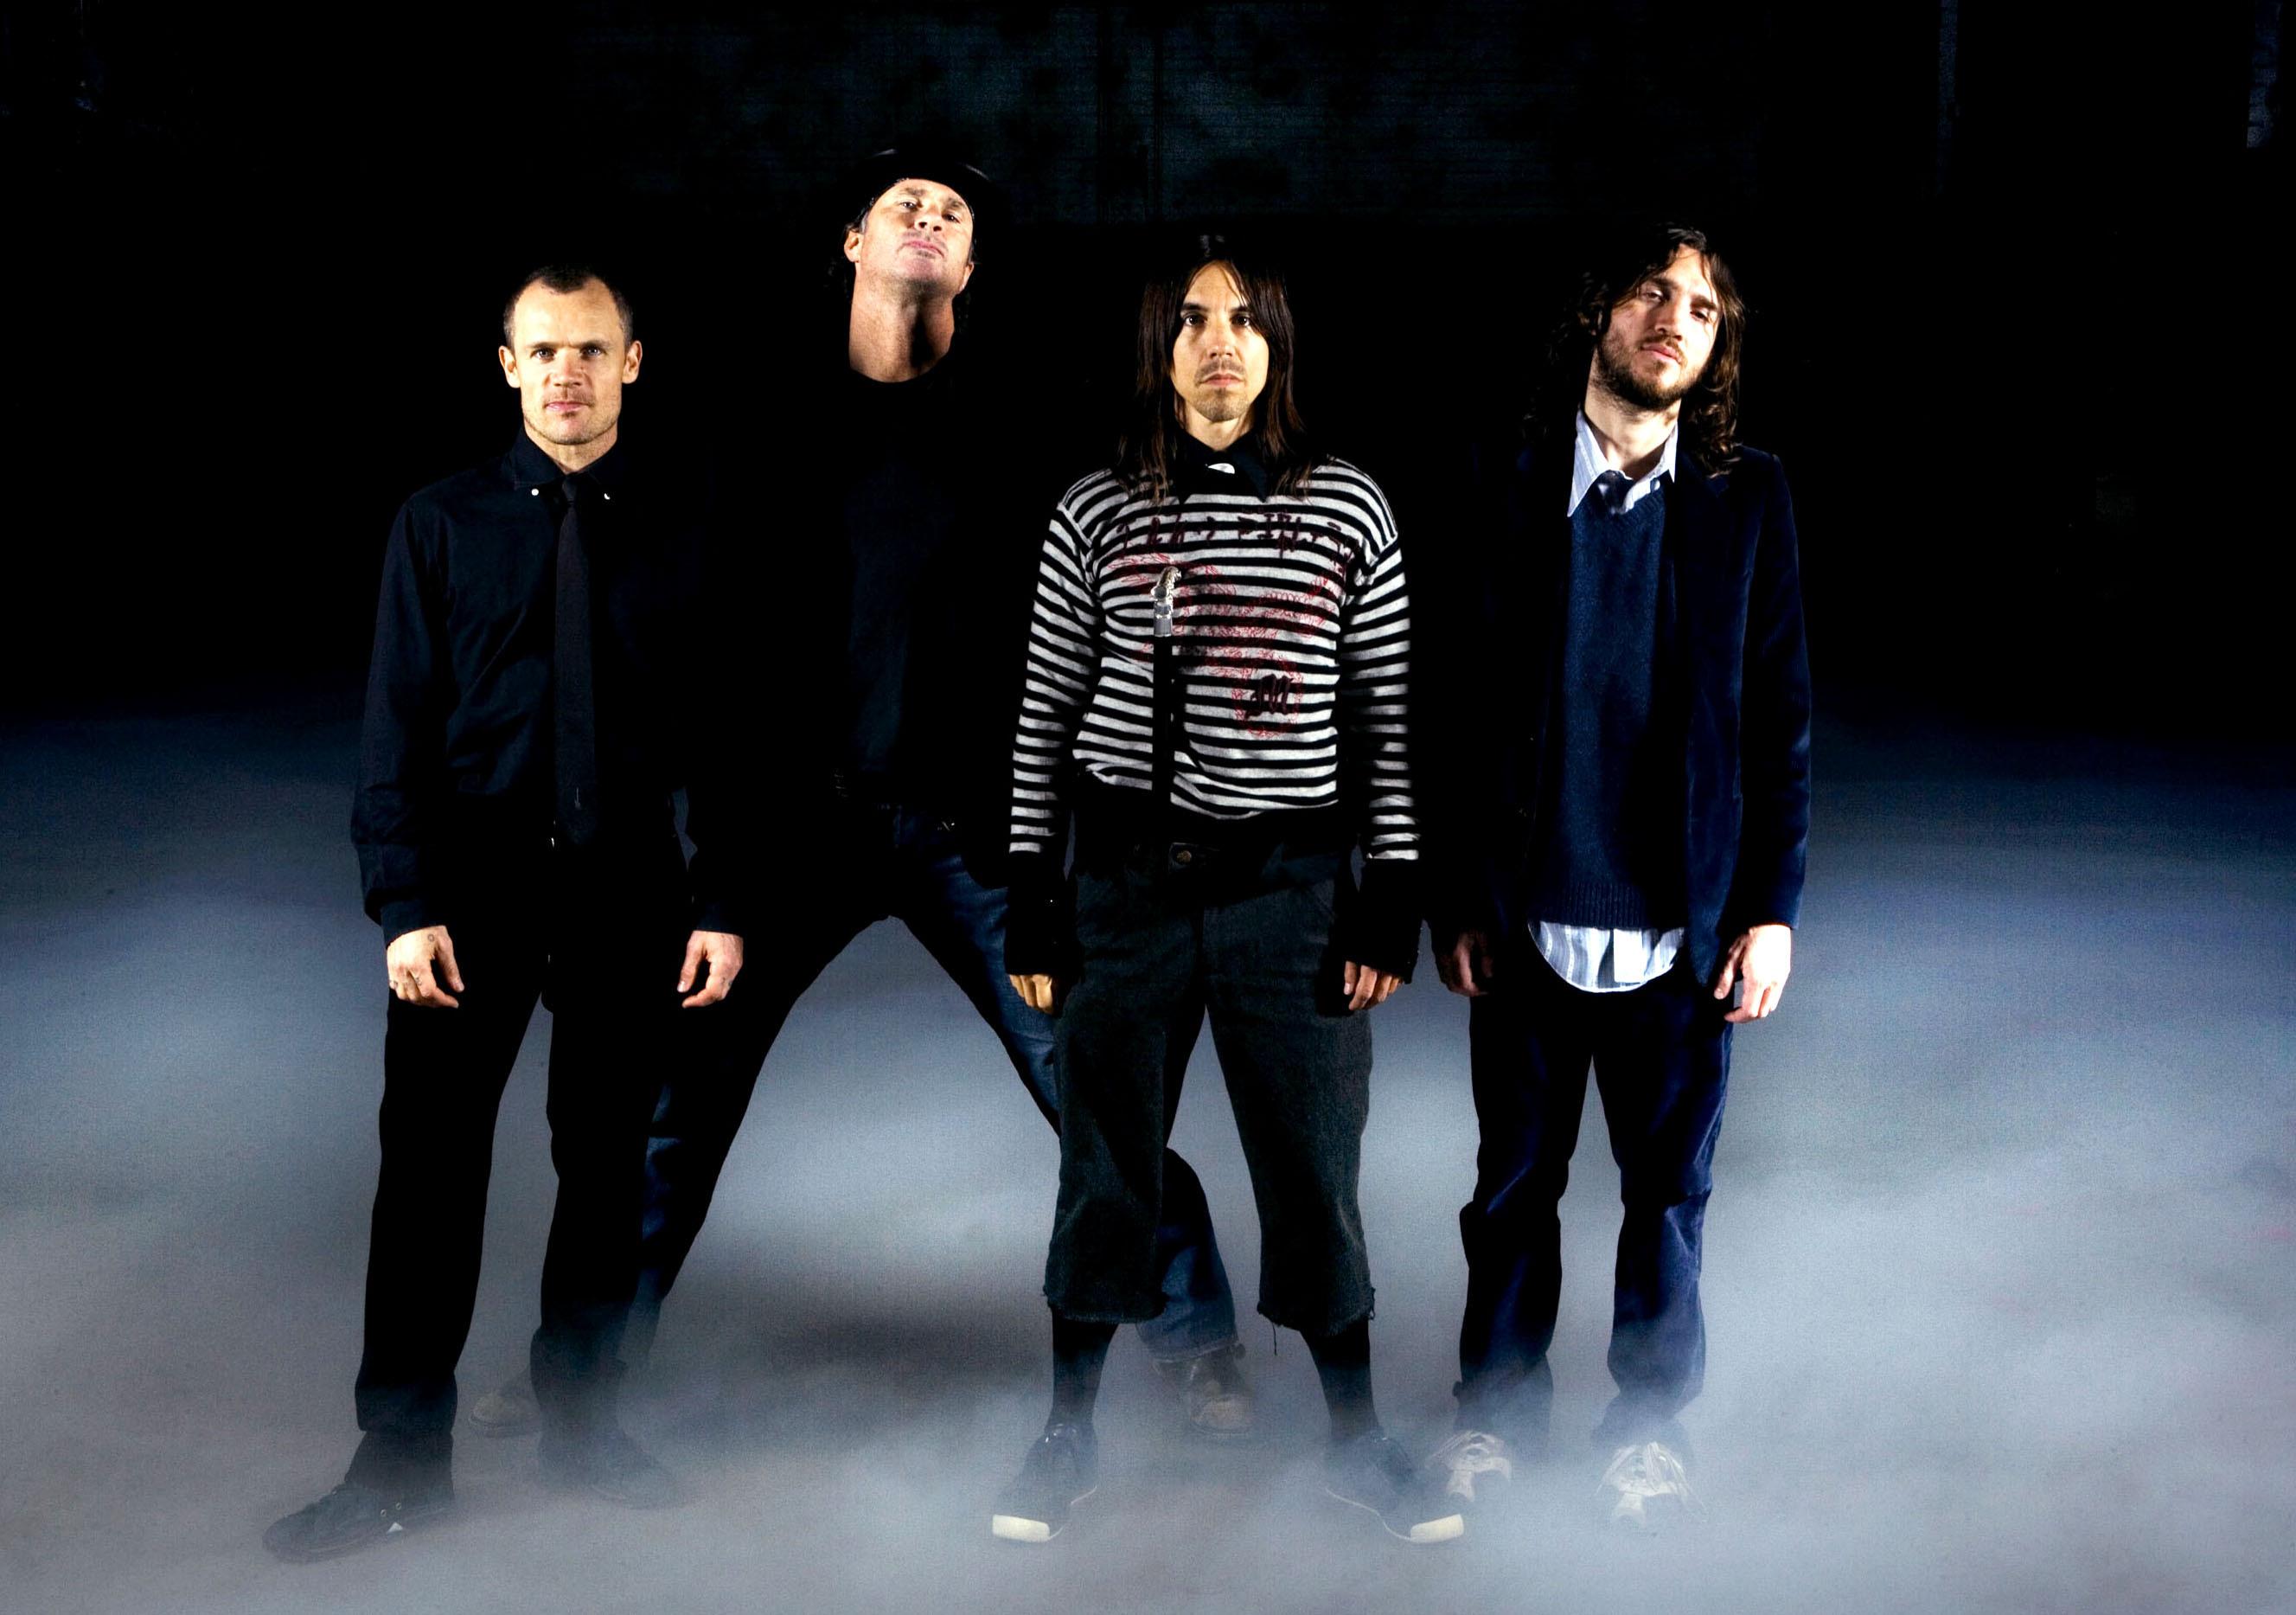 Pochette Dark necessities Red Hot Chili Peppers